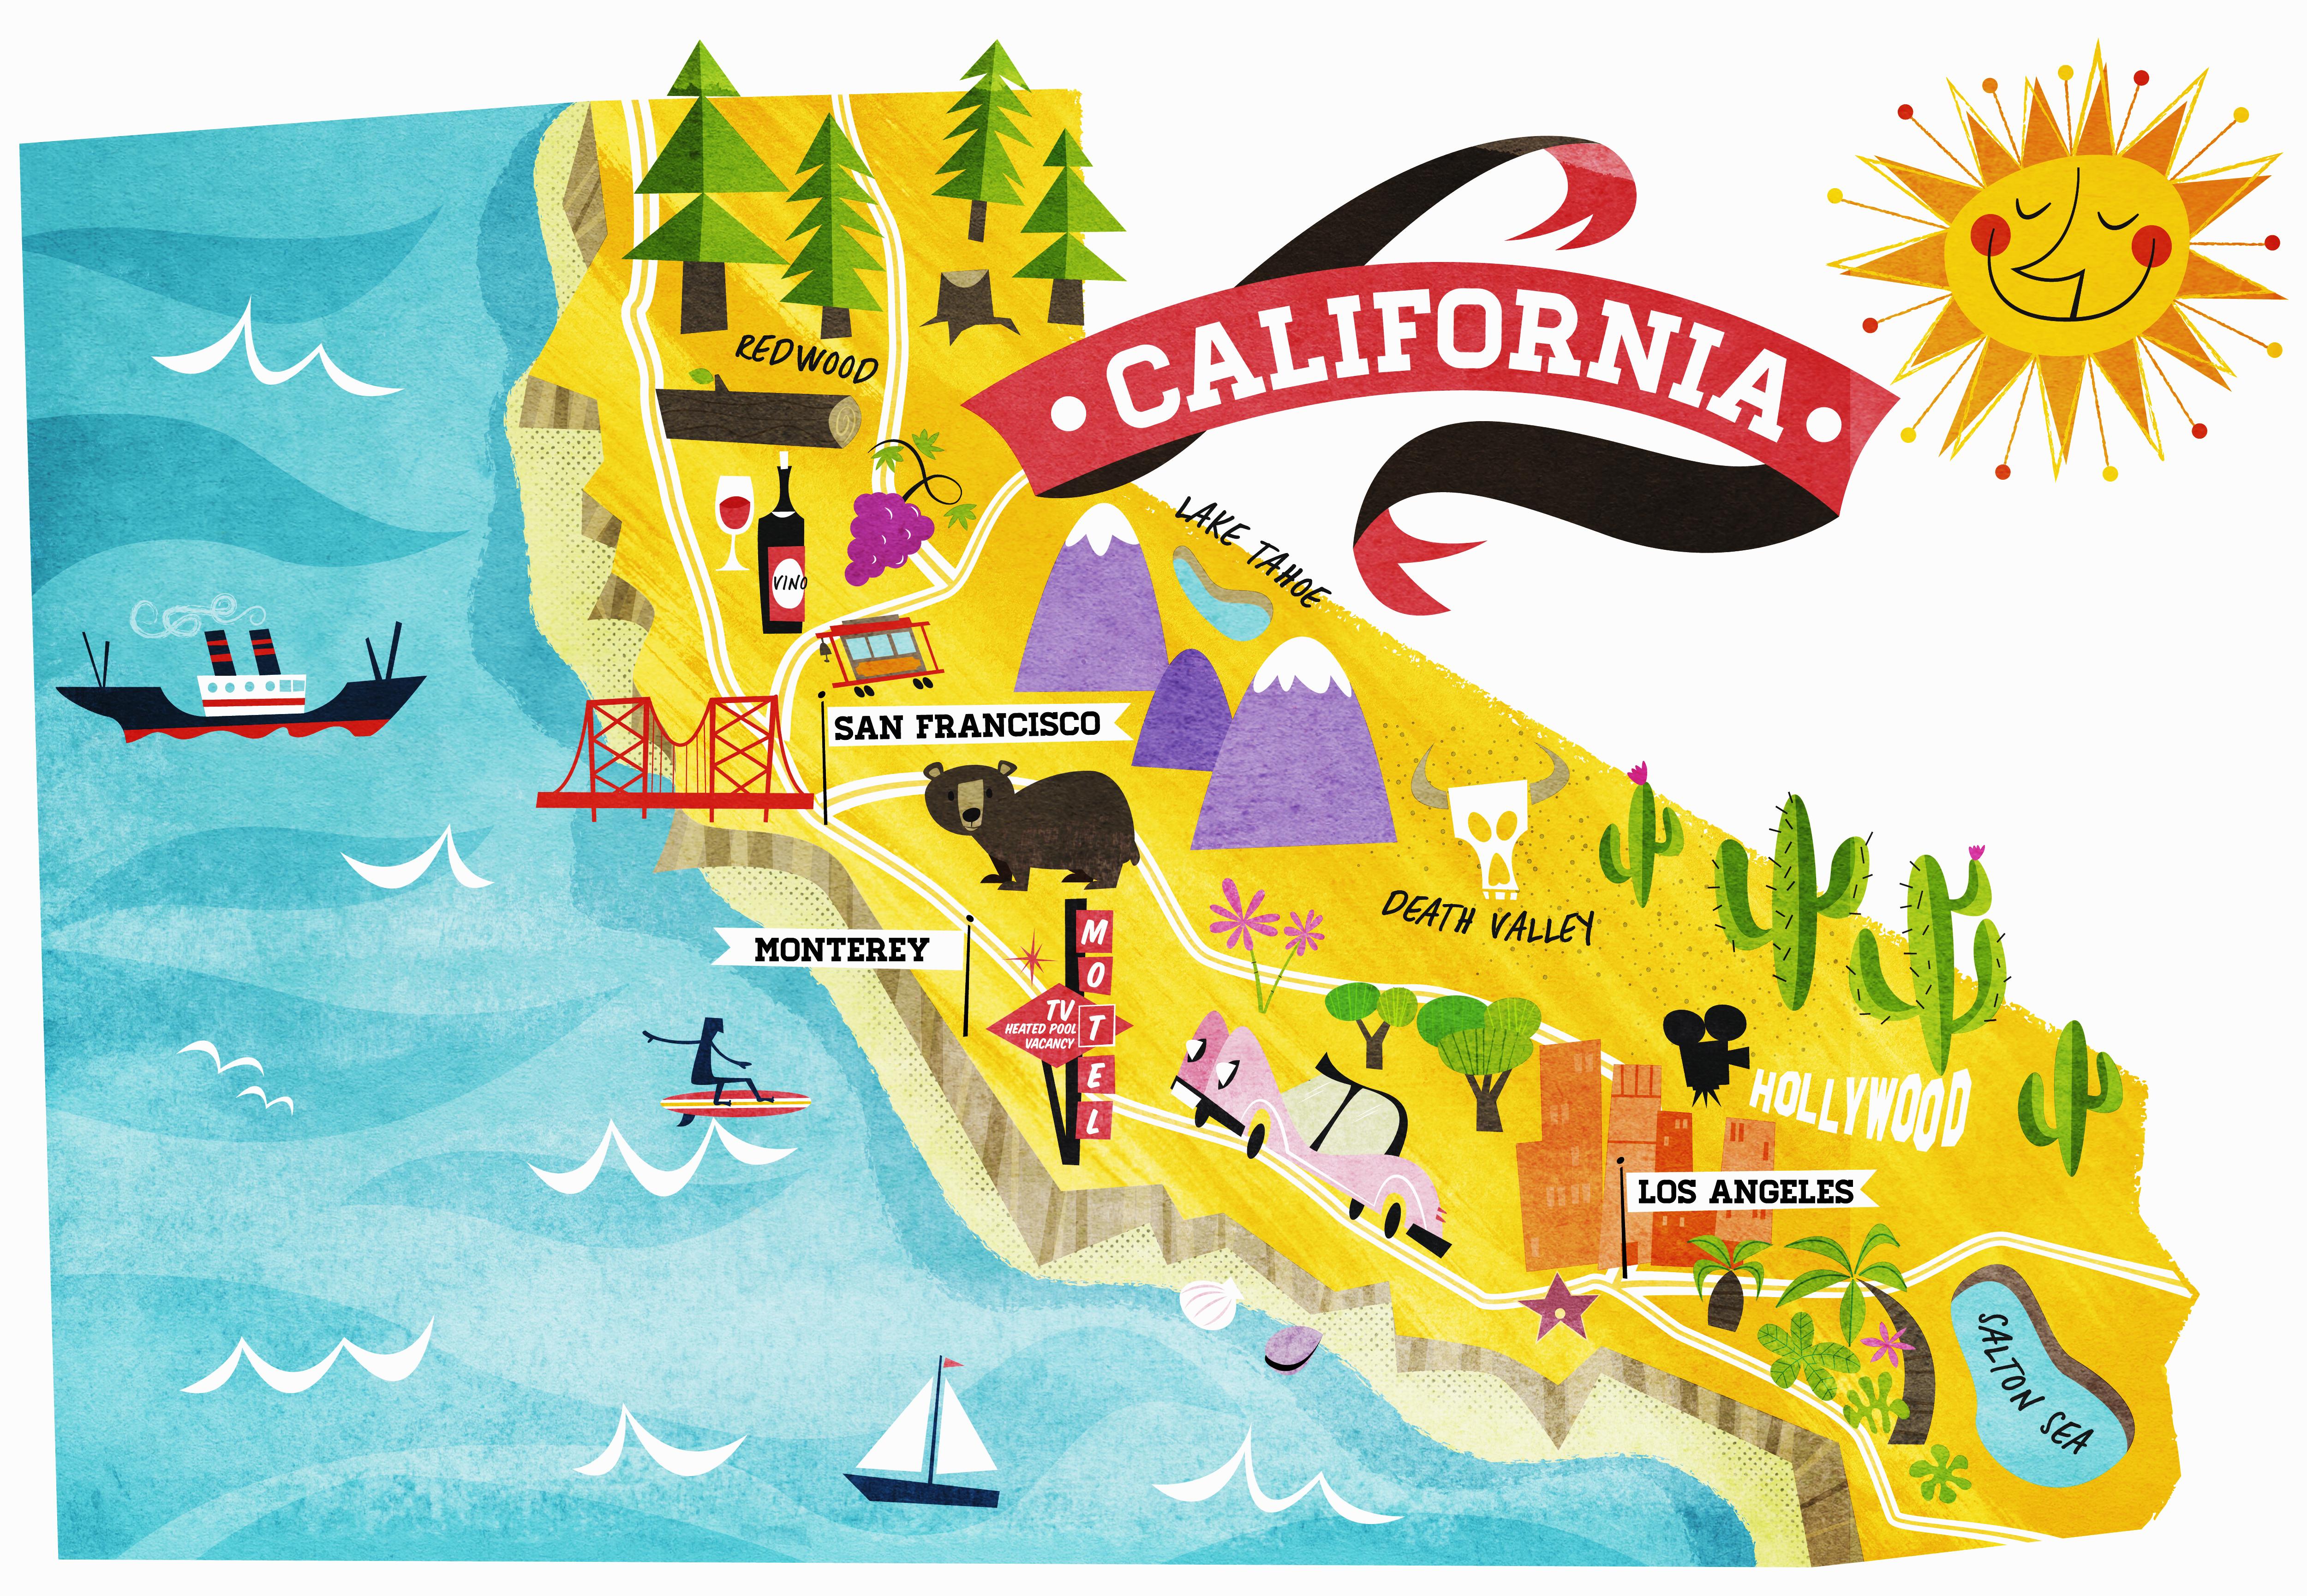 California Coast Attractions Map - Klipy - California Coast Attractions Map